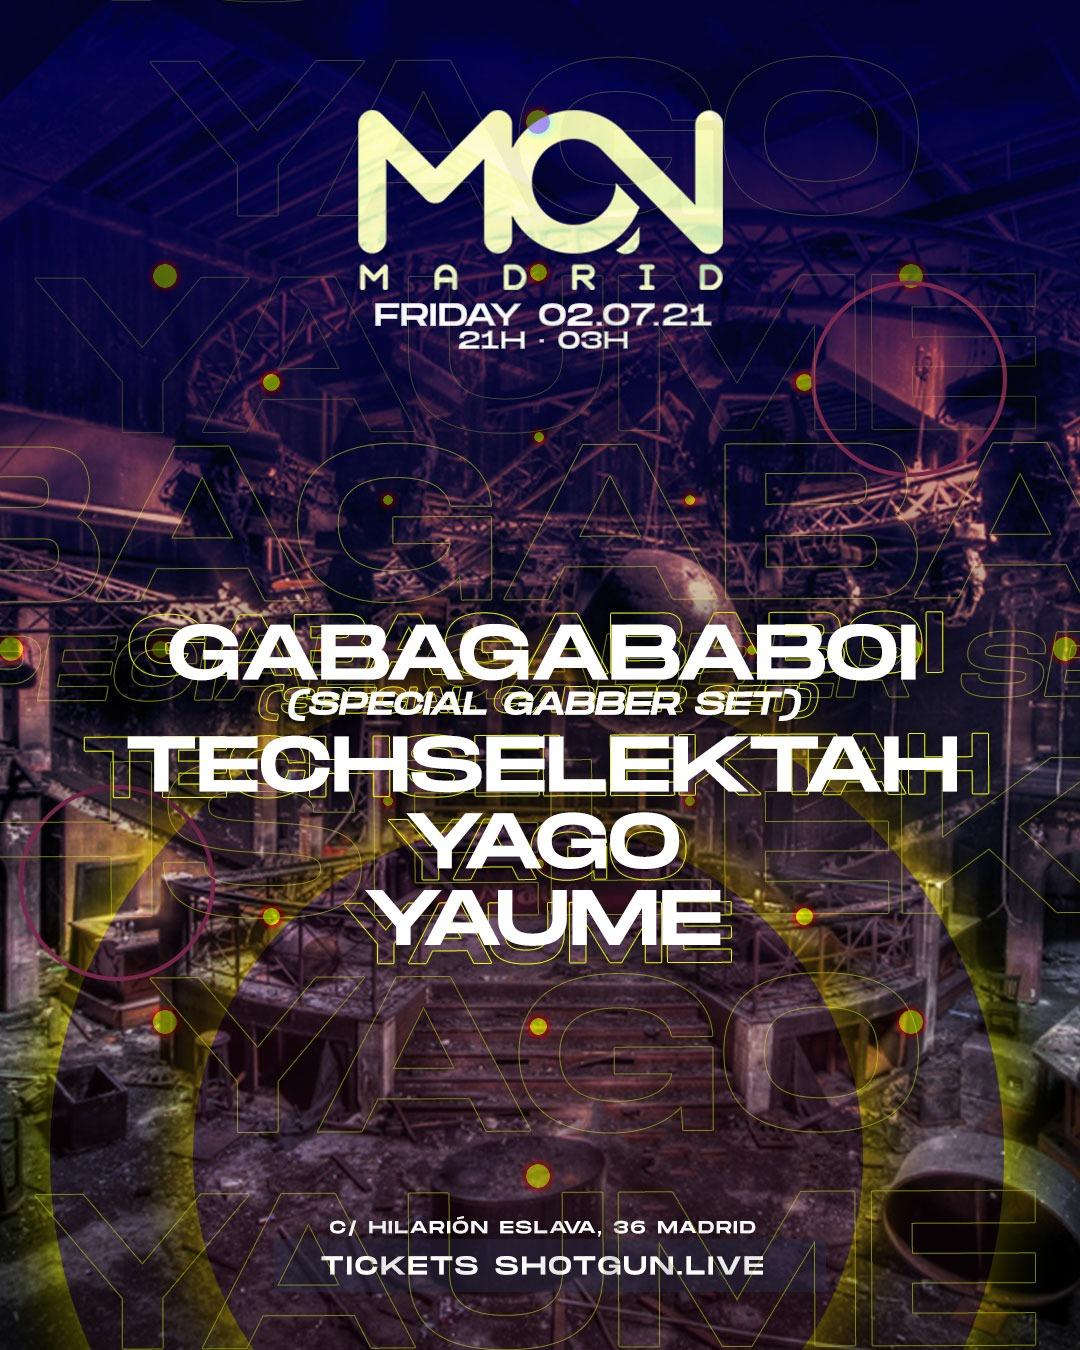 Gabagababoi, Techselektah, Yago & Yaume @Mon Madrid